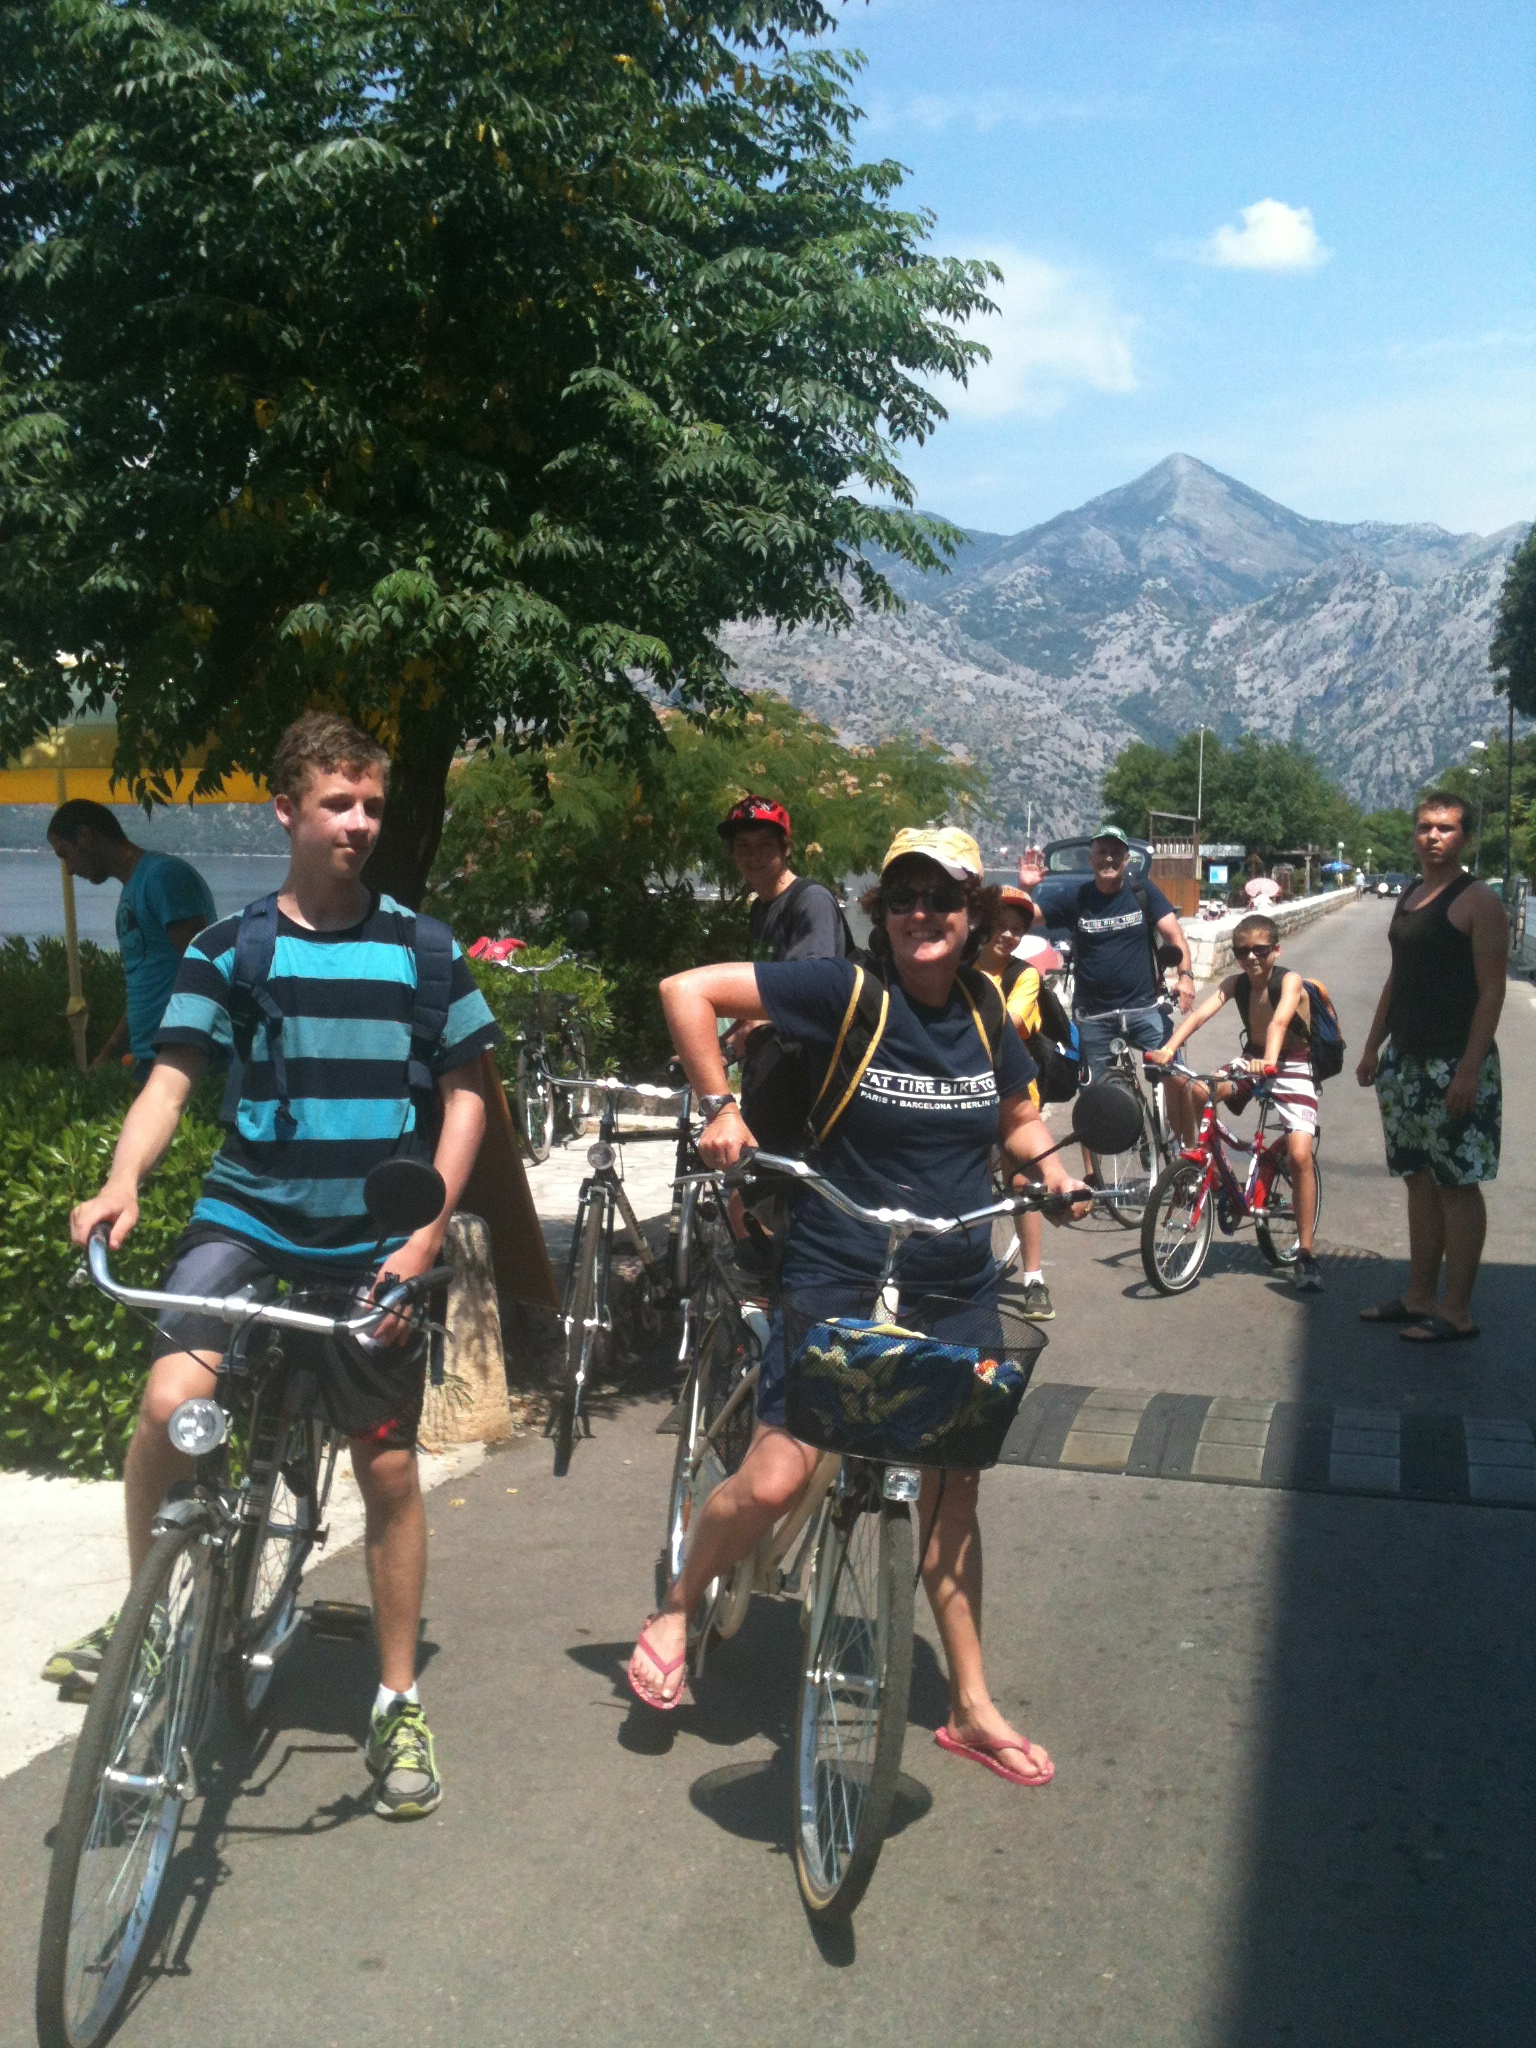 Fun family activity in Kotor